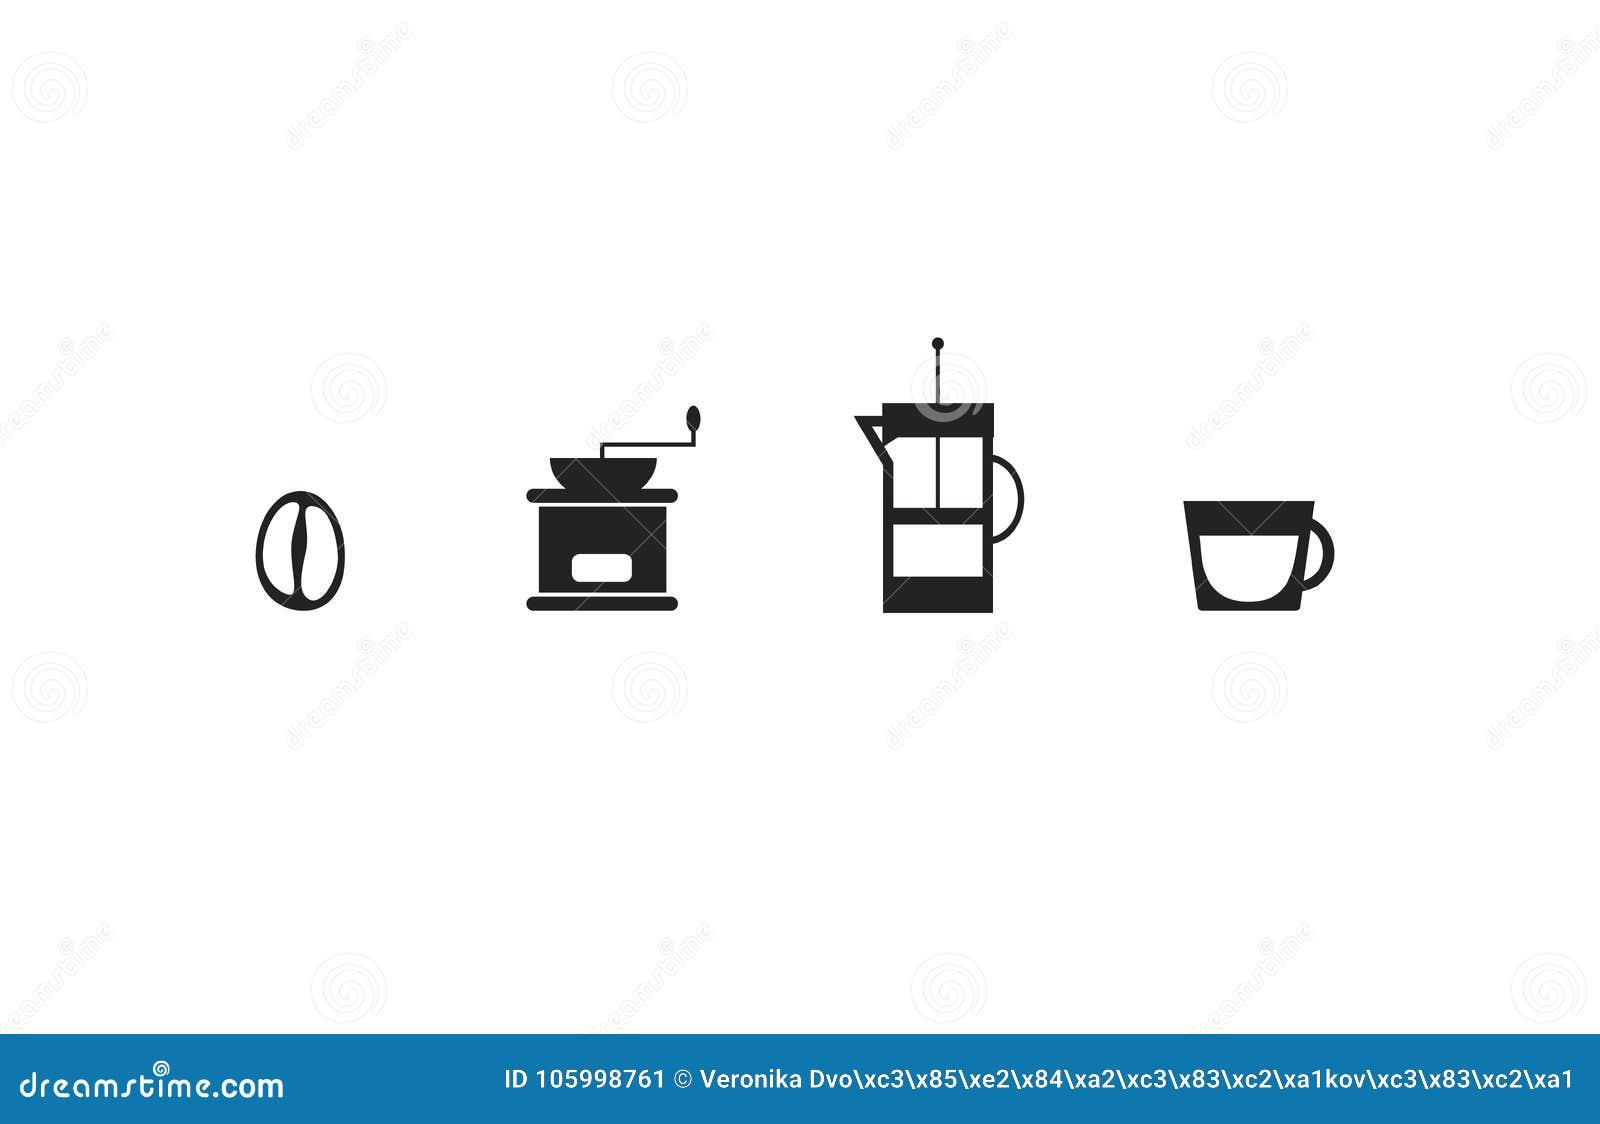 Reeks van Vier Eenvoudige Pictogrammen met Koffiethema: Koffieboon, Klassieke Molen, Franse Persketel en Kleine Kop